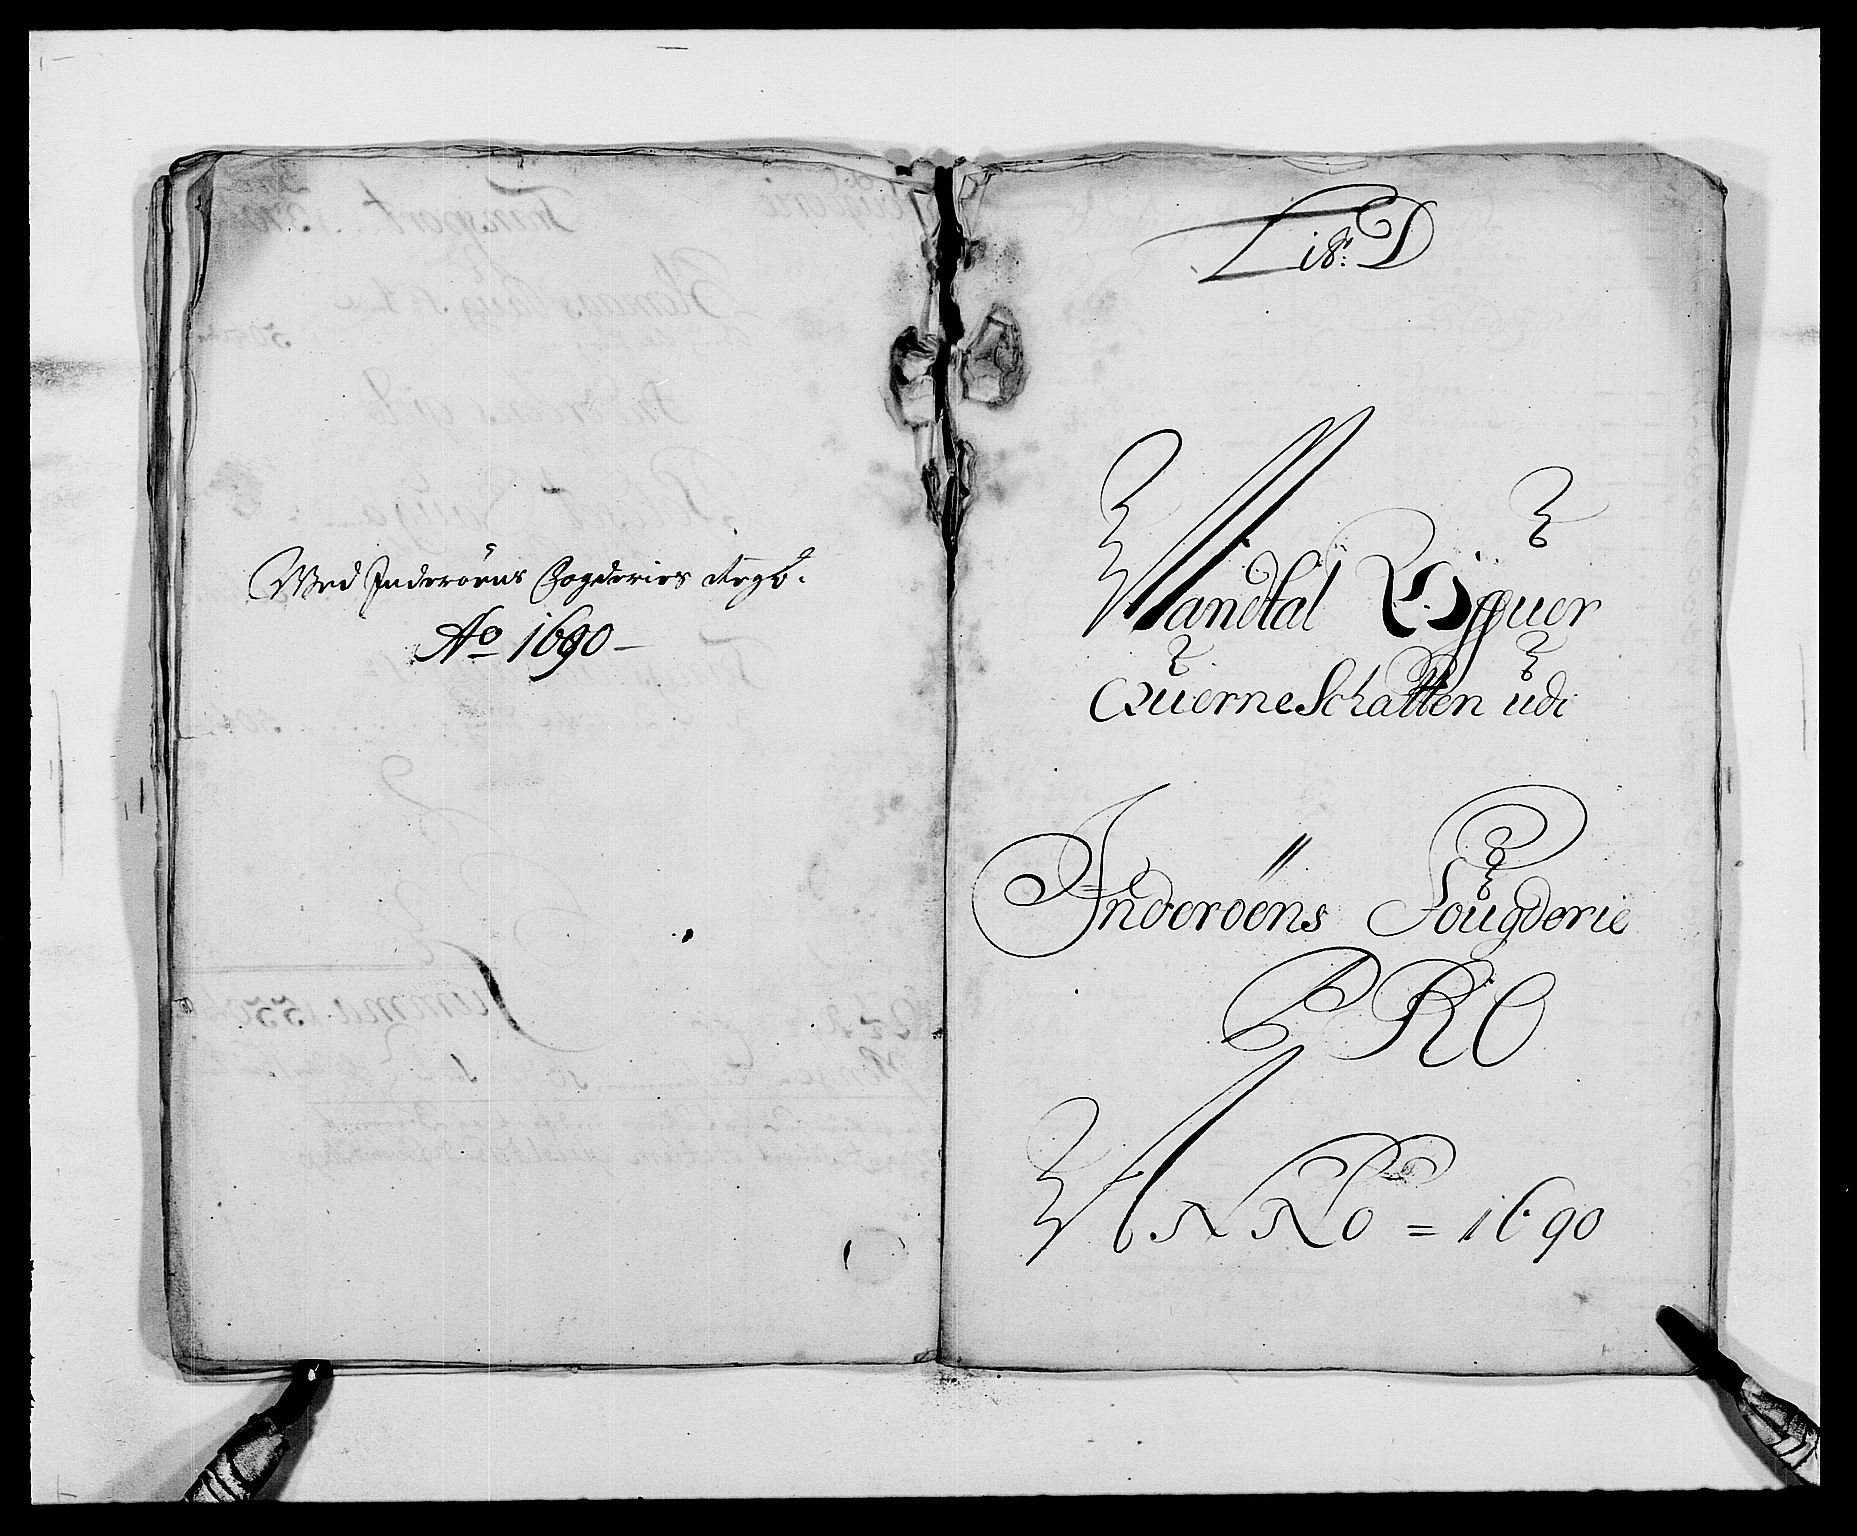 RA, Rentekammeret inntil 1814, Reviderte regnskaper, Fogderegnskap, R63/L4307: Fogderegnskap Inderøy, 1690-1691, s. 76